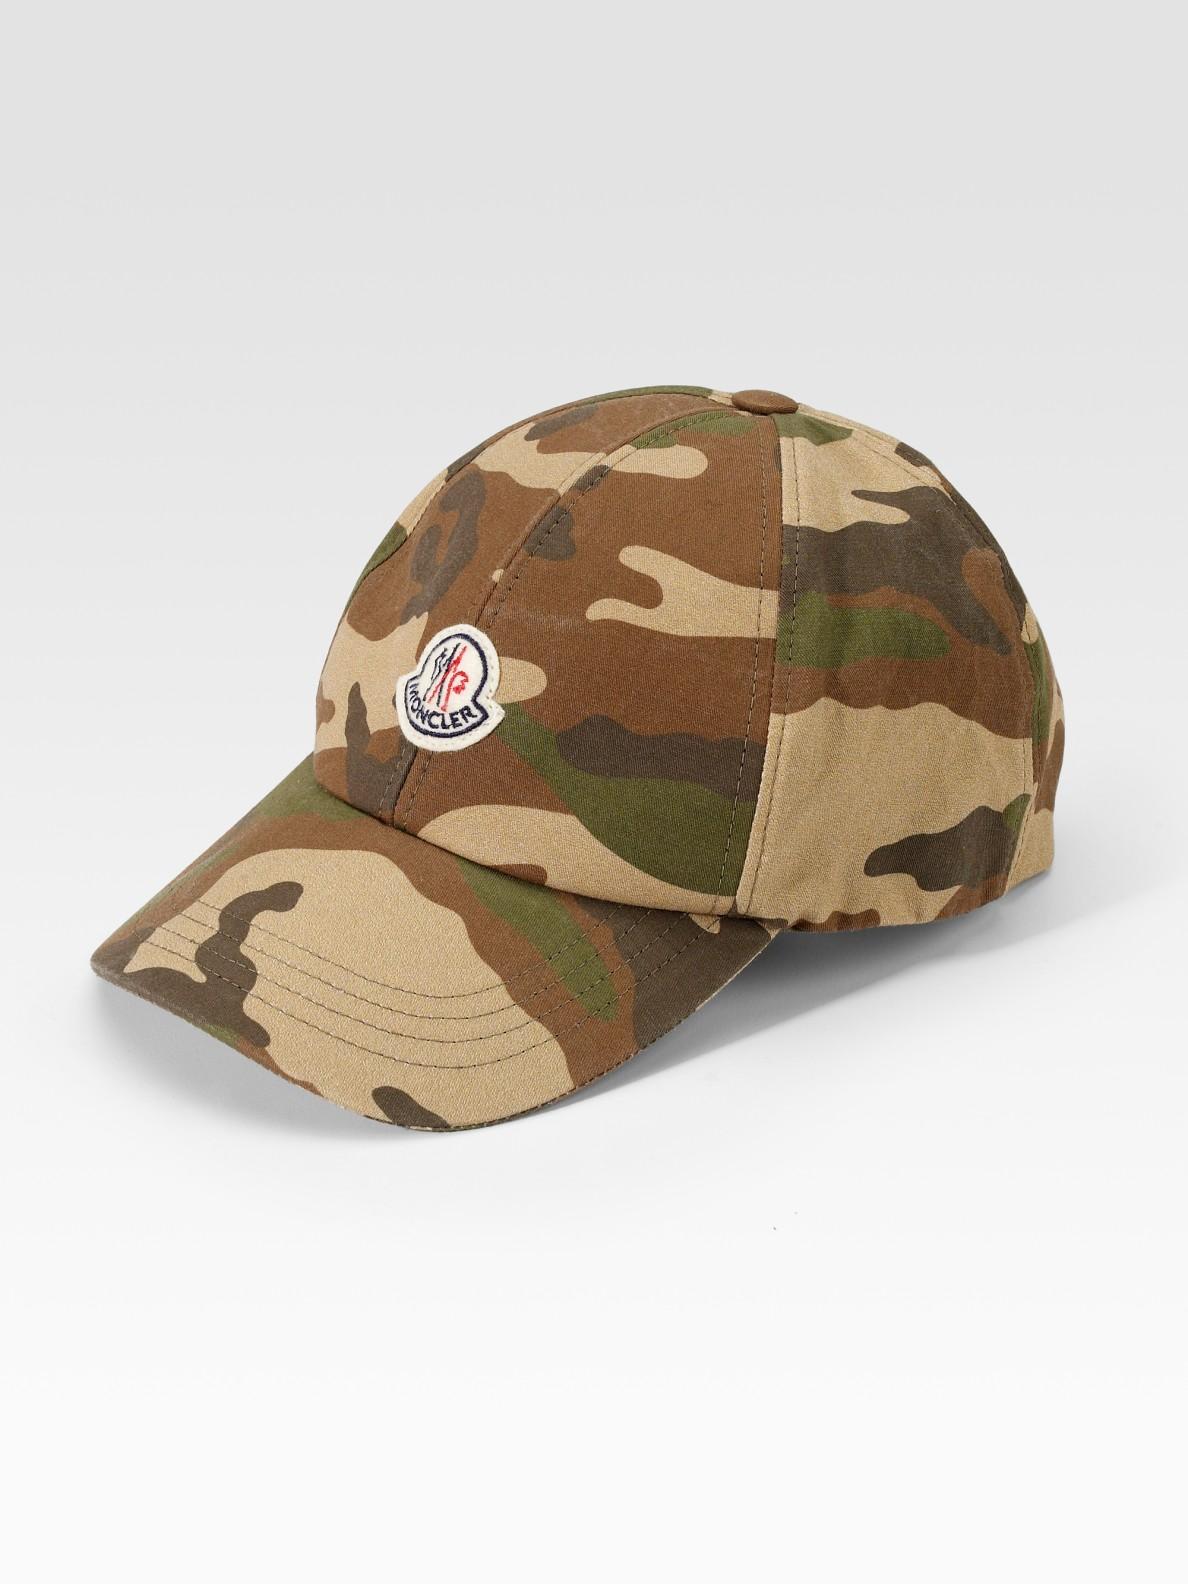 Lyst - Moncler Camo Baseball Hat in Green for Men 221a3e80498